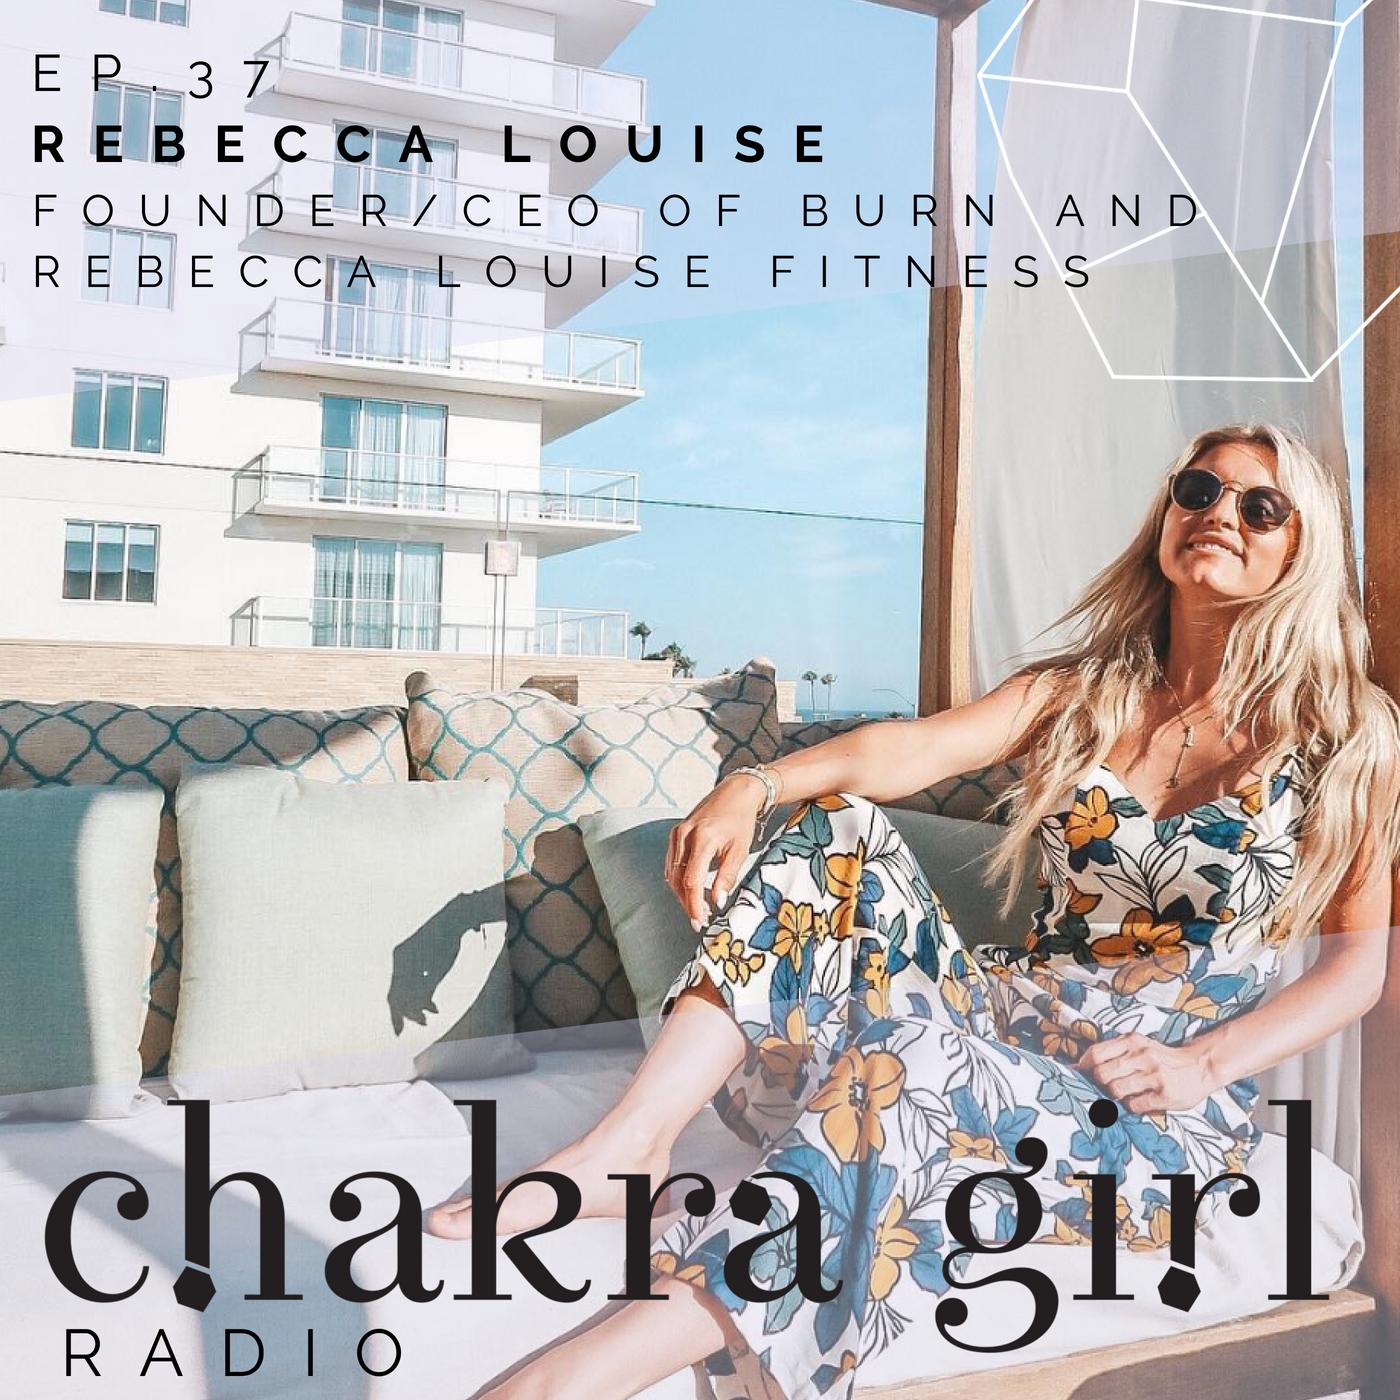 REBECCA LOUISE CHAKRA GIRL RADIO.png